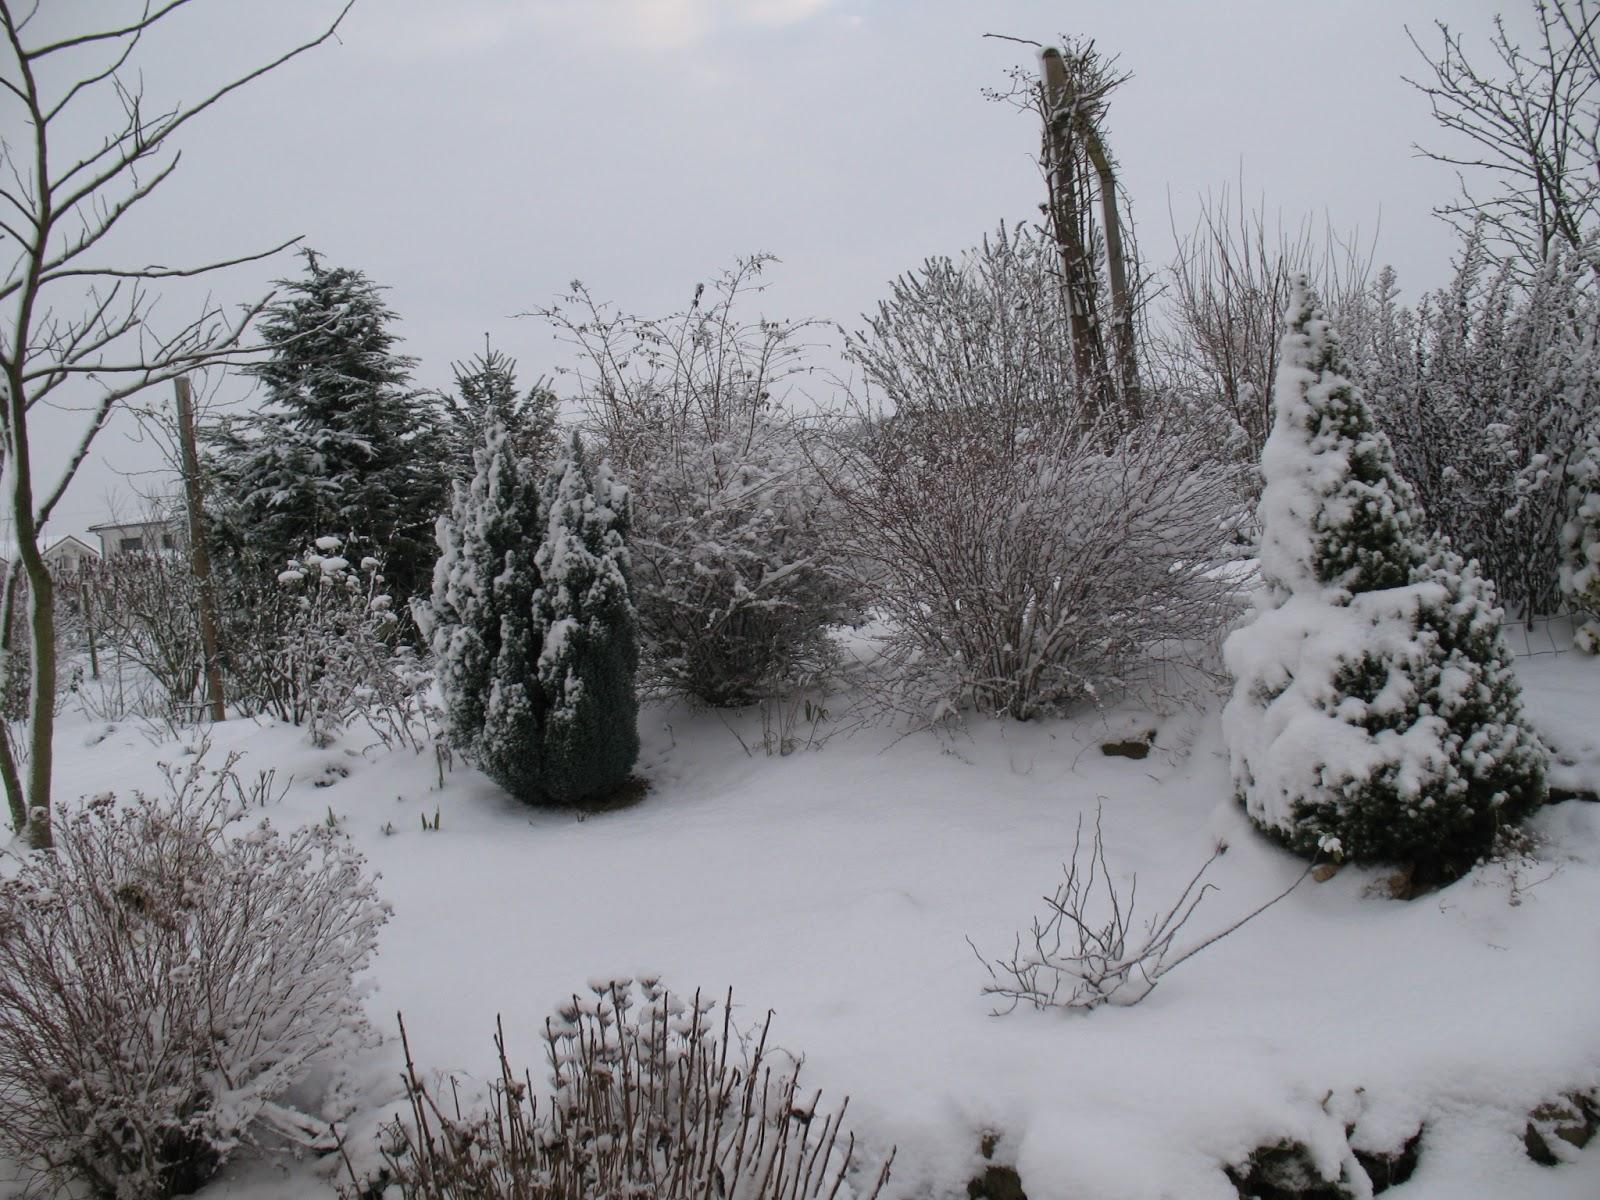 Roses du jardin ch neland le jardin sous la neige for Beau jardin en hiver